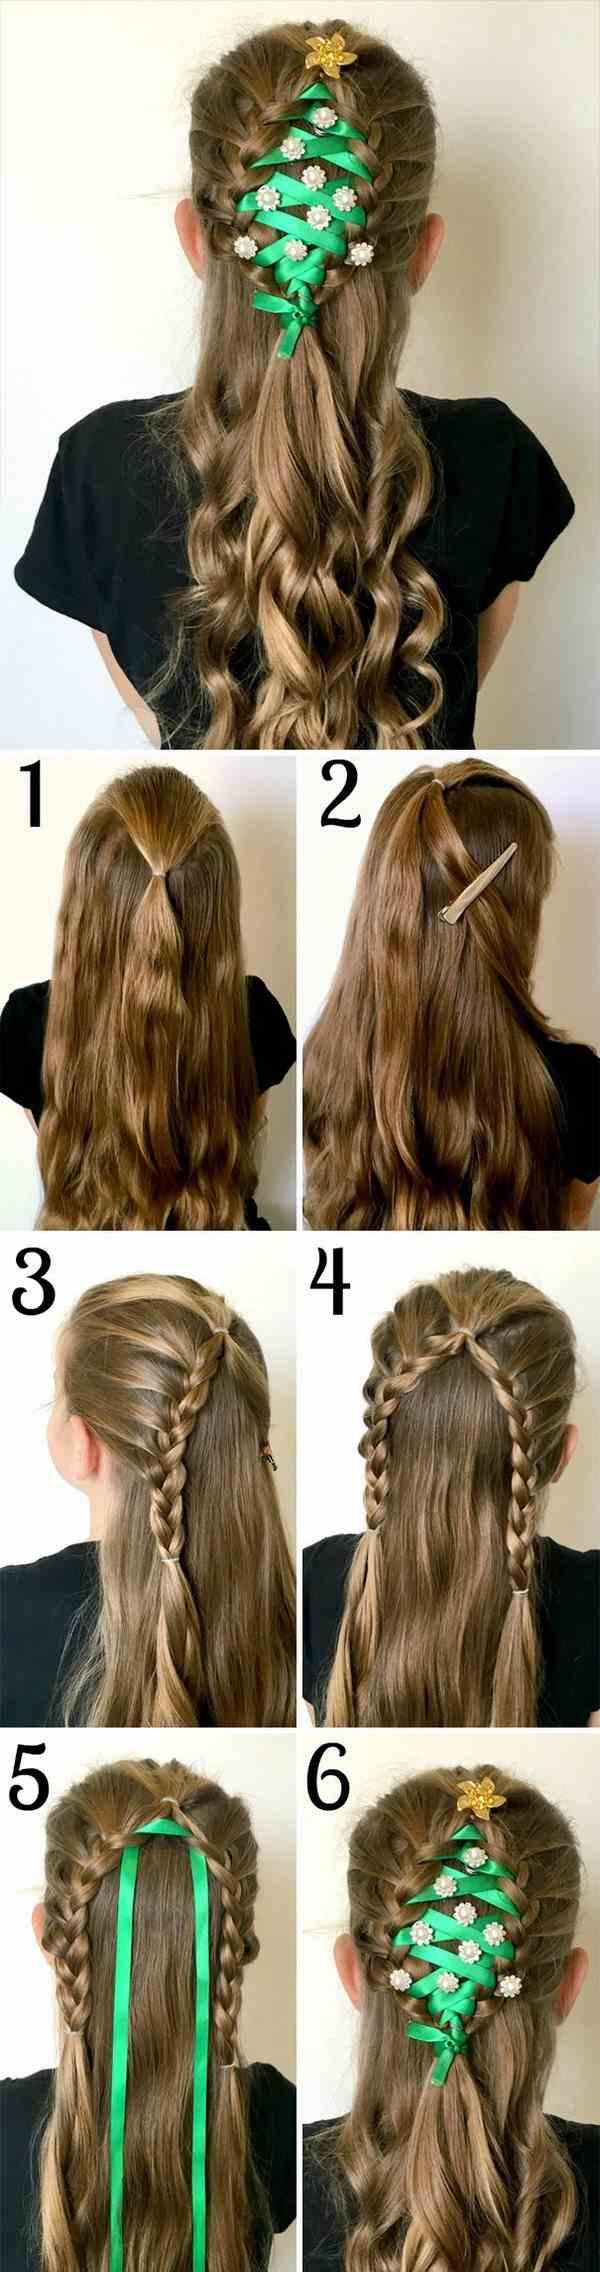 Best Christmas Hair Ideas For Girls With Long Hair Cute Christmas Hairstyles Littlegirls Princess Hair Styles Long Hair Girl Long Hair Styles